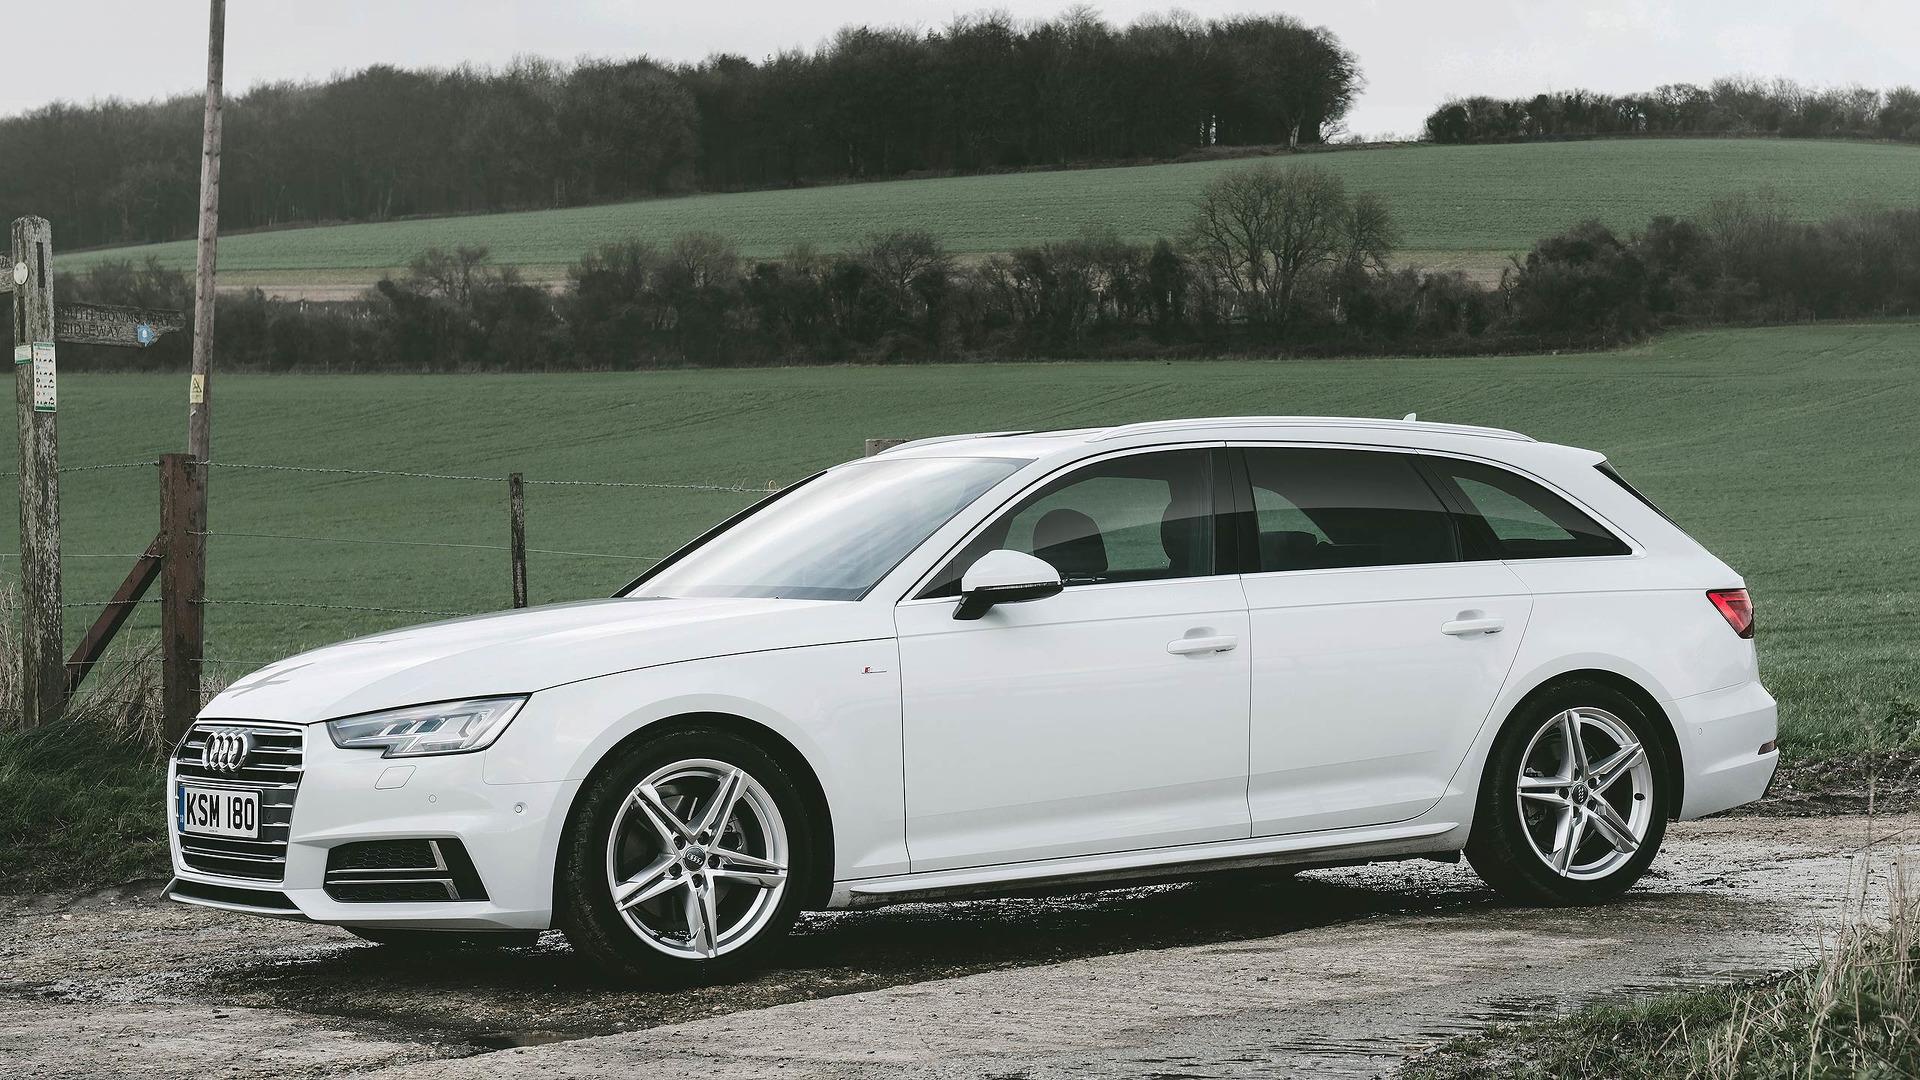 Motor1.com UK